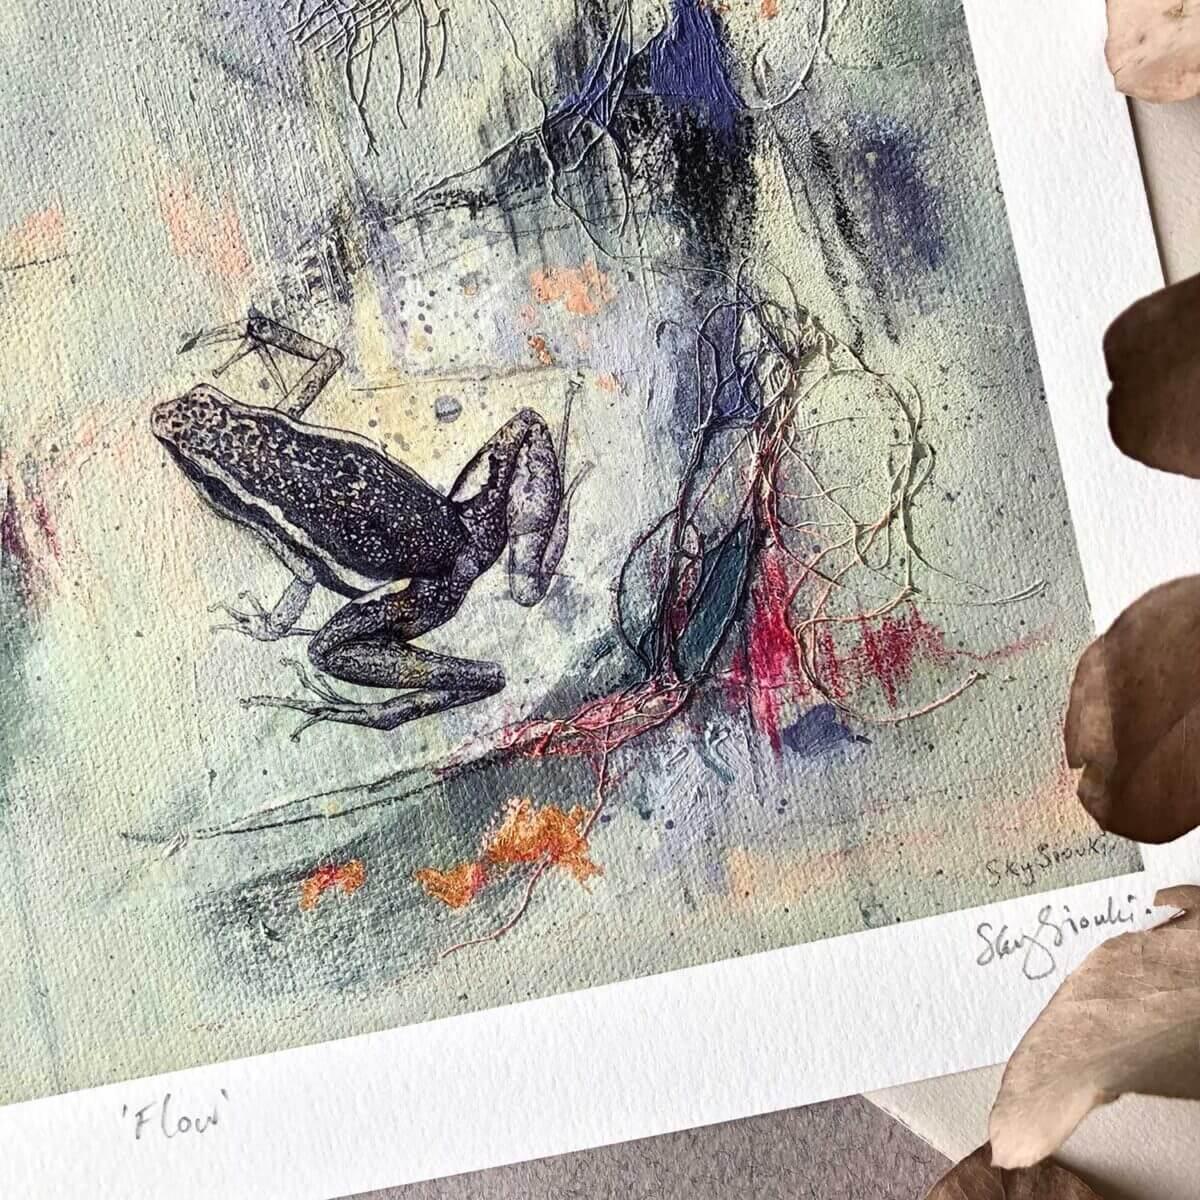 Flow-Print-Frog-Sky-Siouki